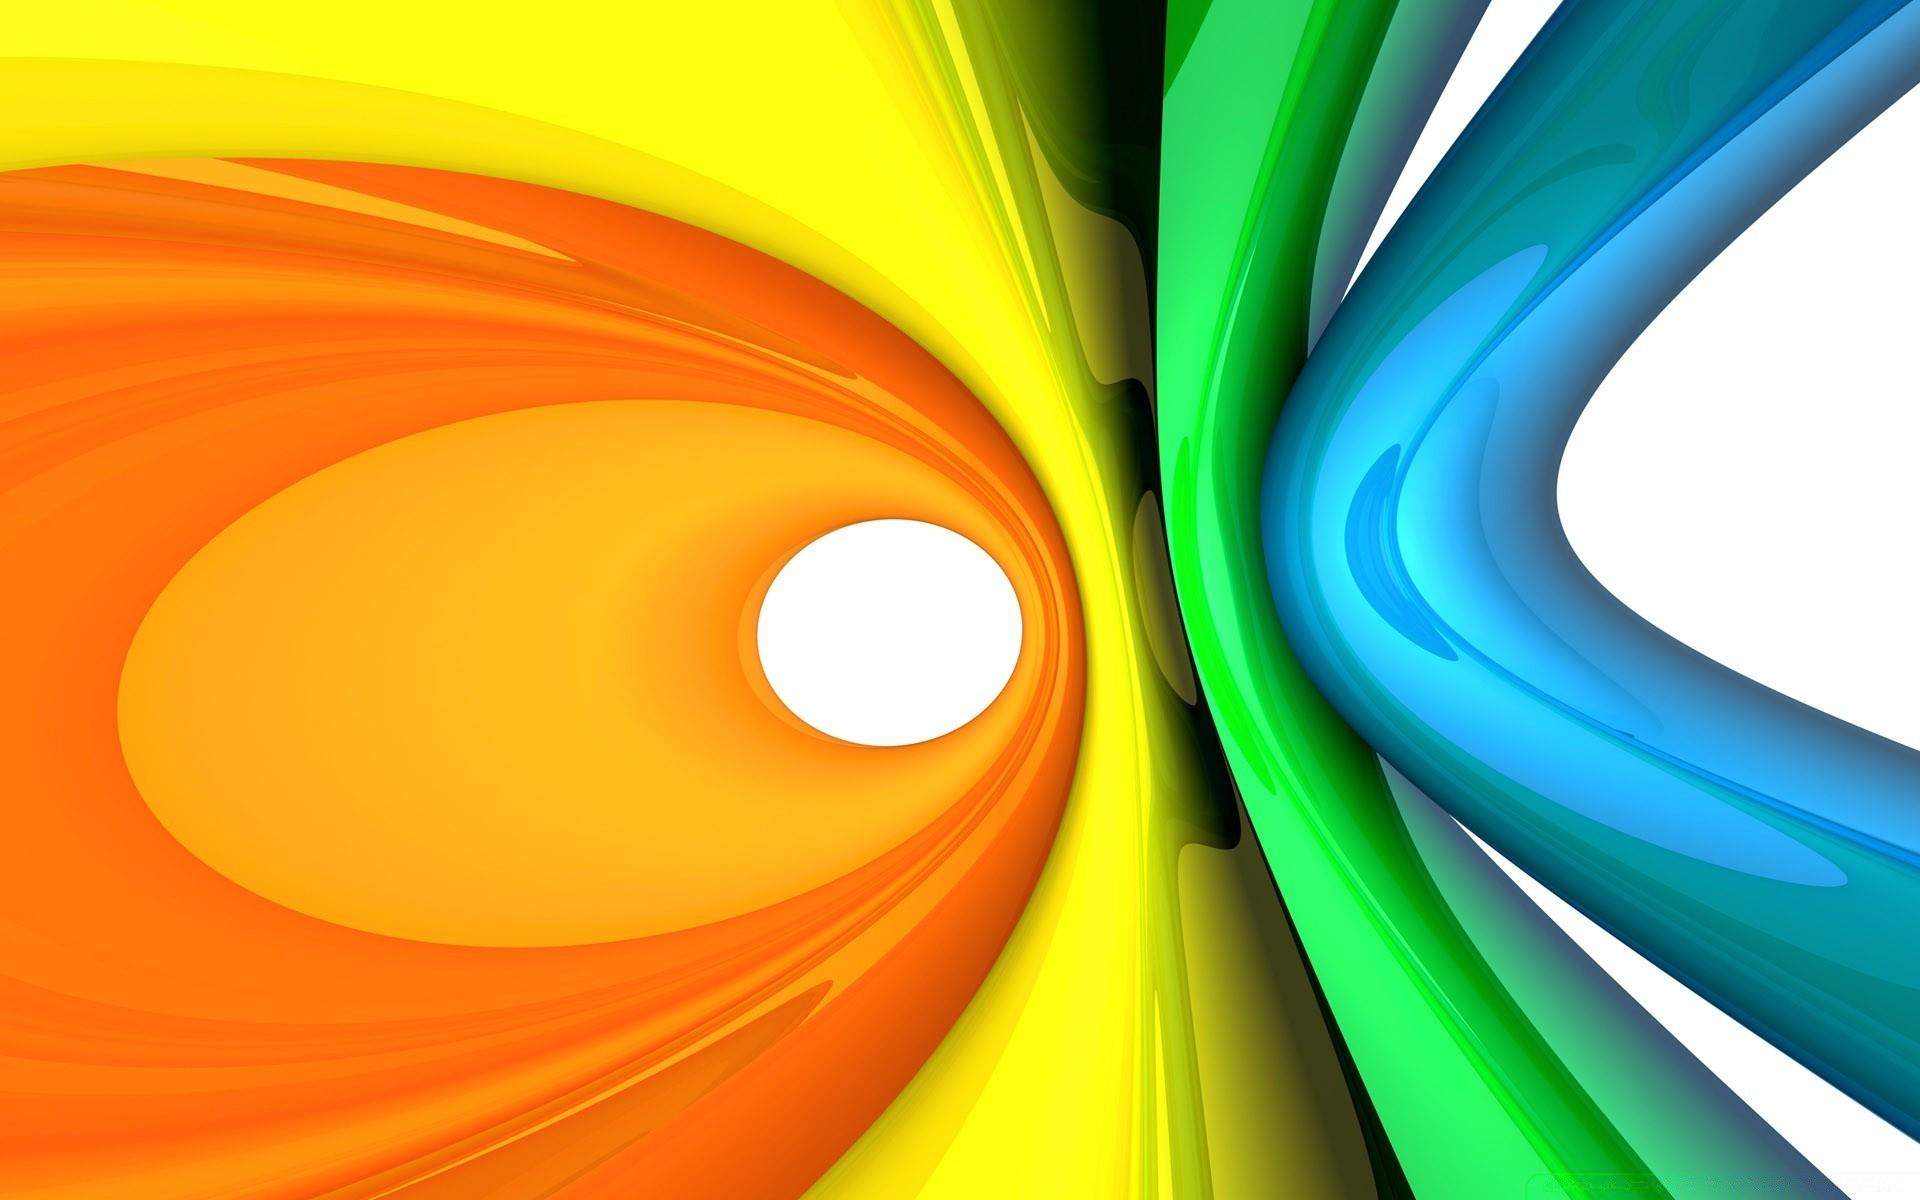 Обои диафрагма, узор, объем. Абстракции foto 8